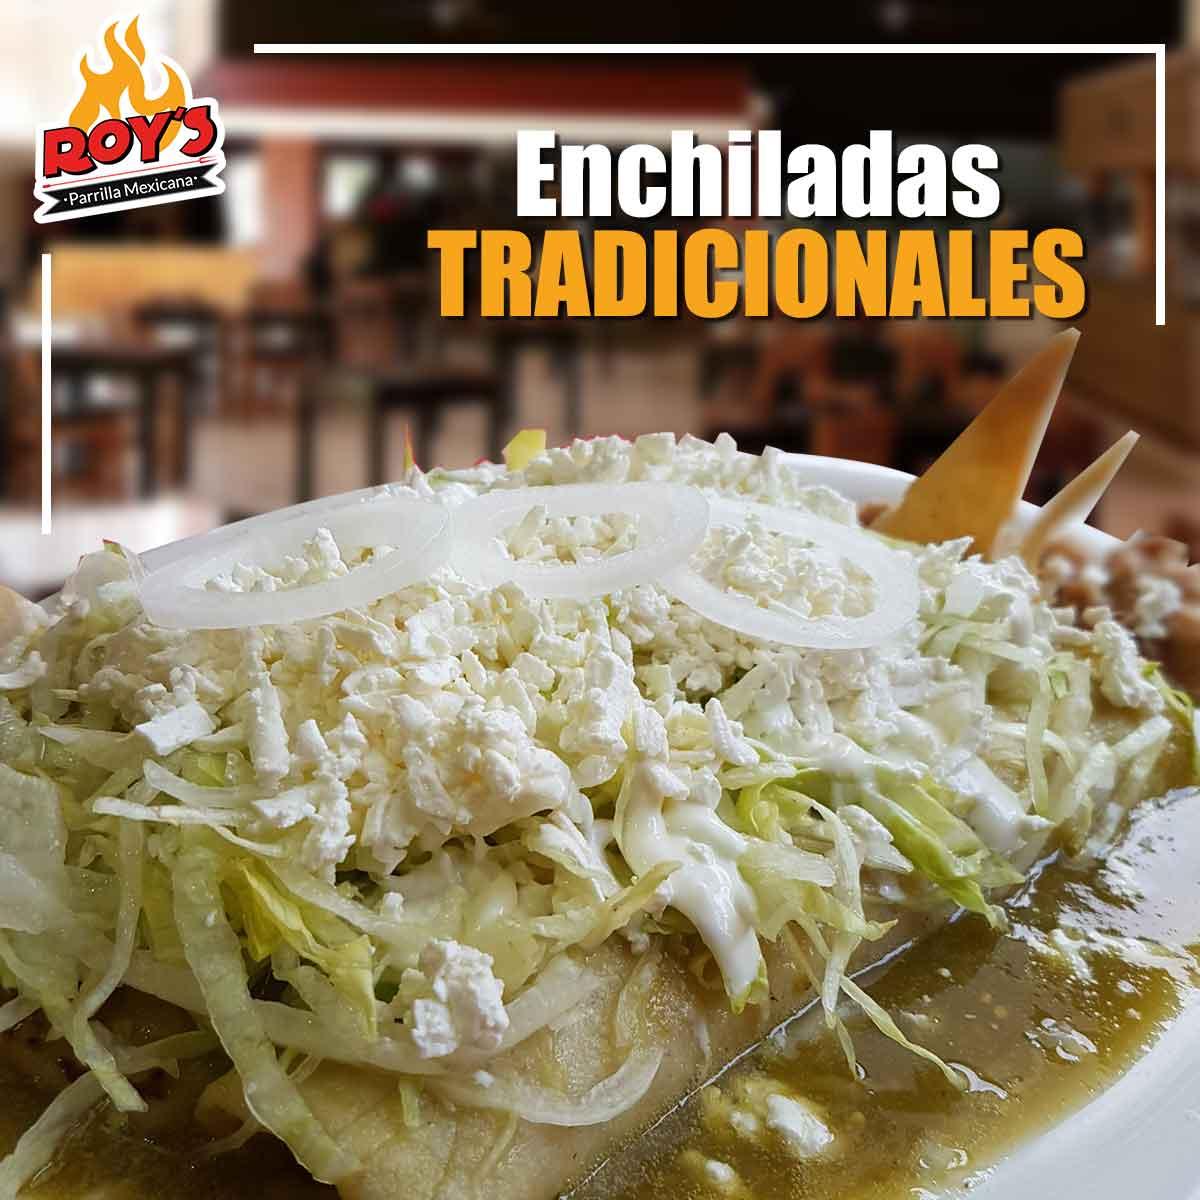 Enchiladas Tradicionales